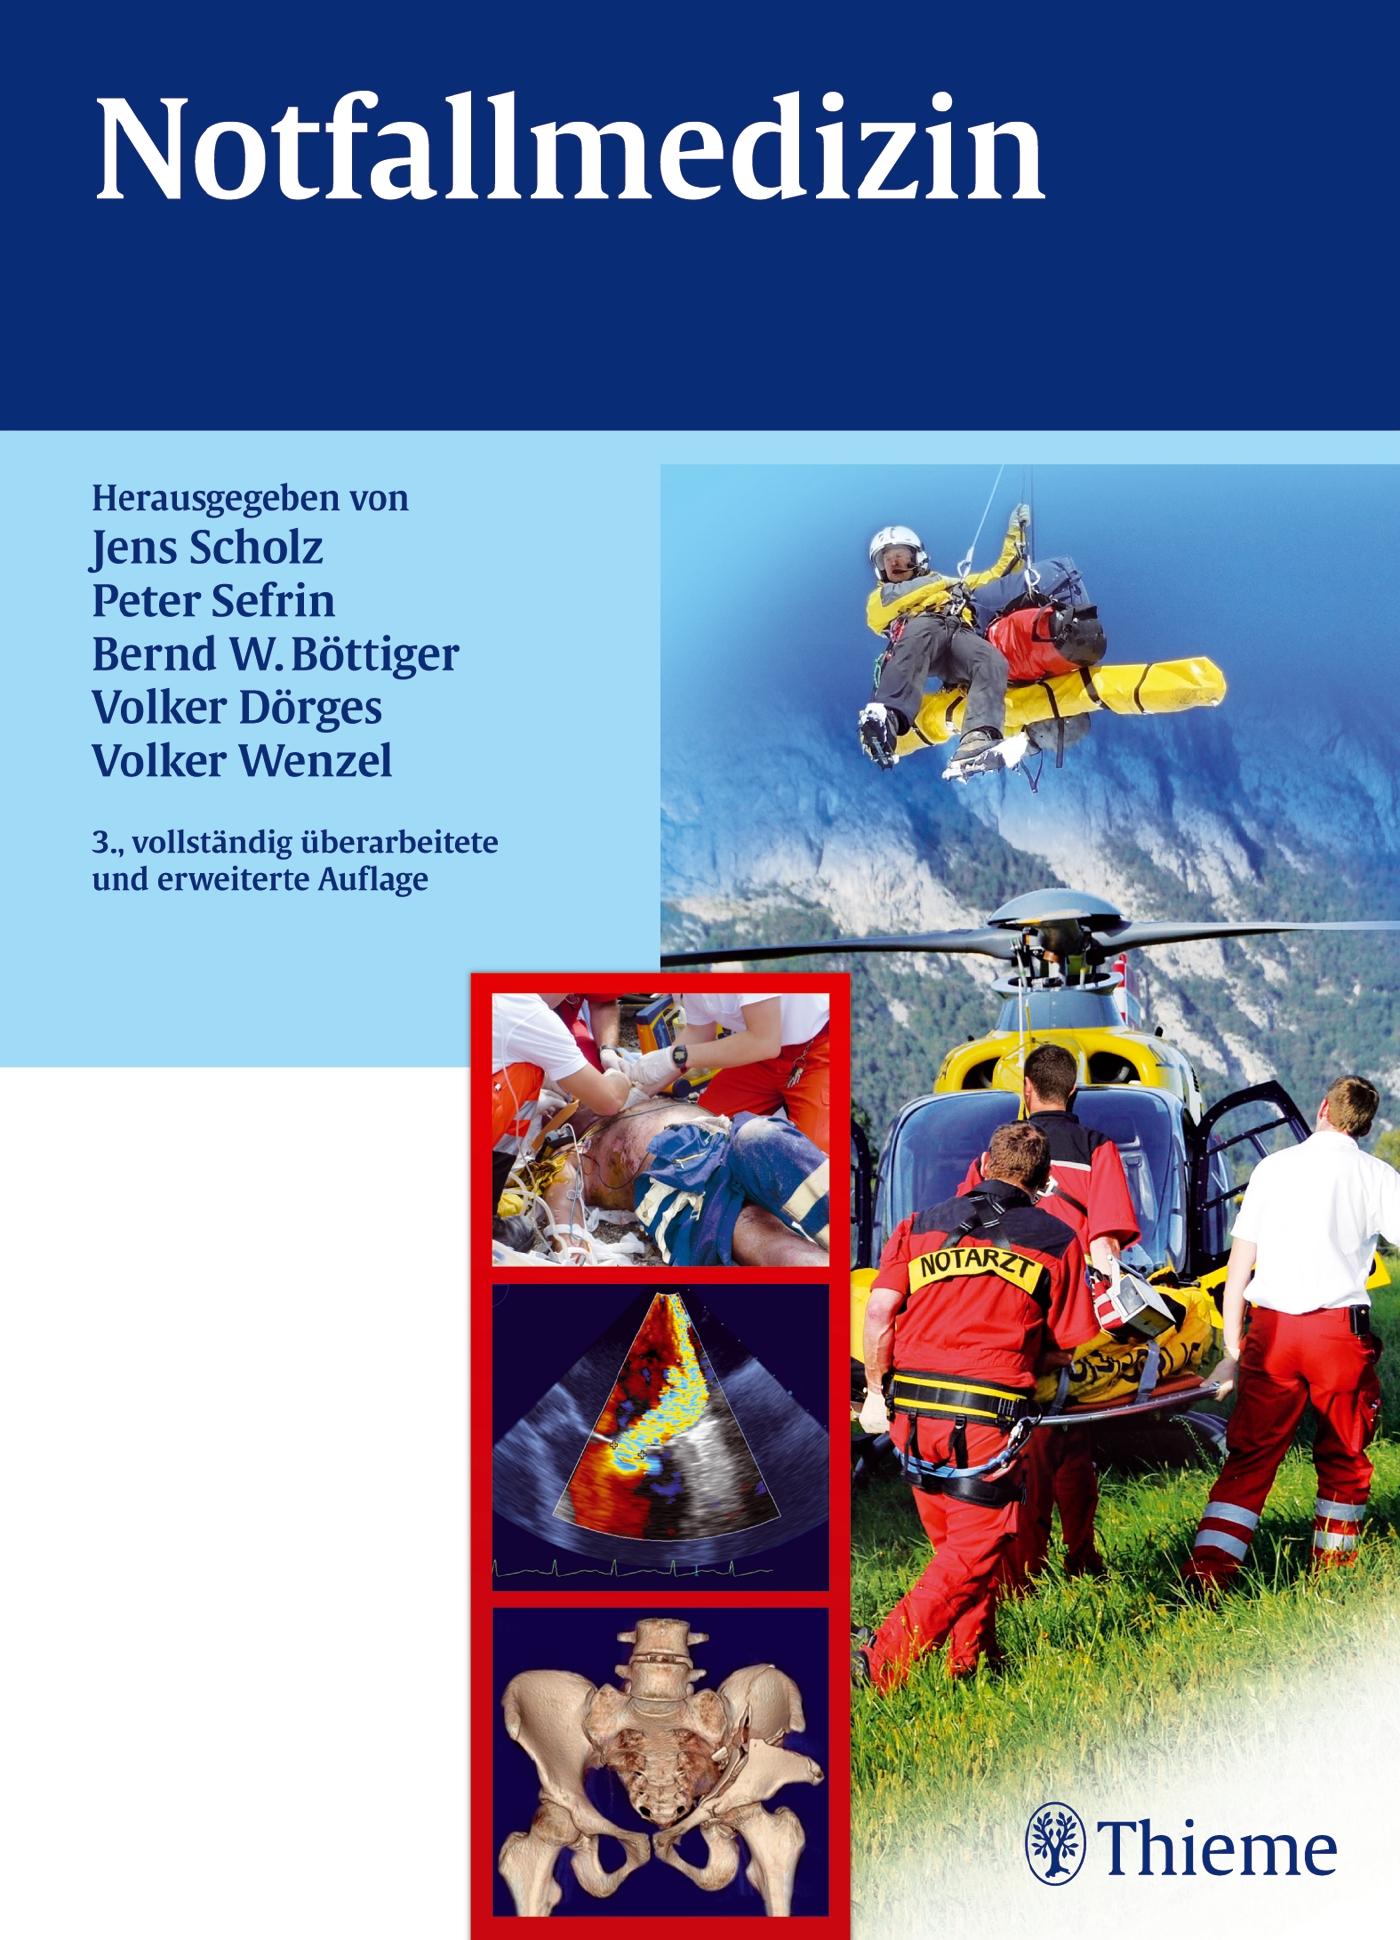 Notfallmedizin - Jens Scholz [Gebundene Ausgabe, 3. Auflage 2012]